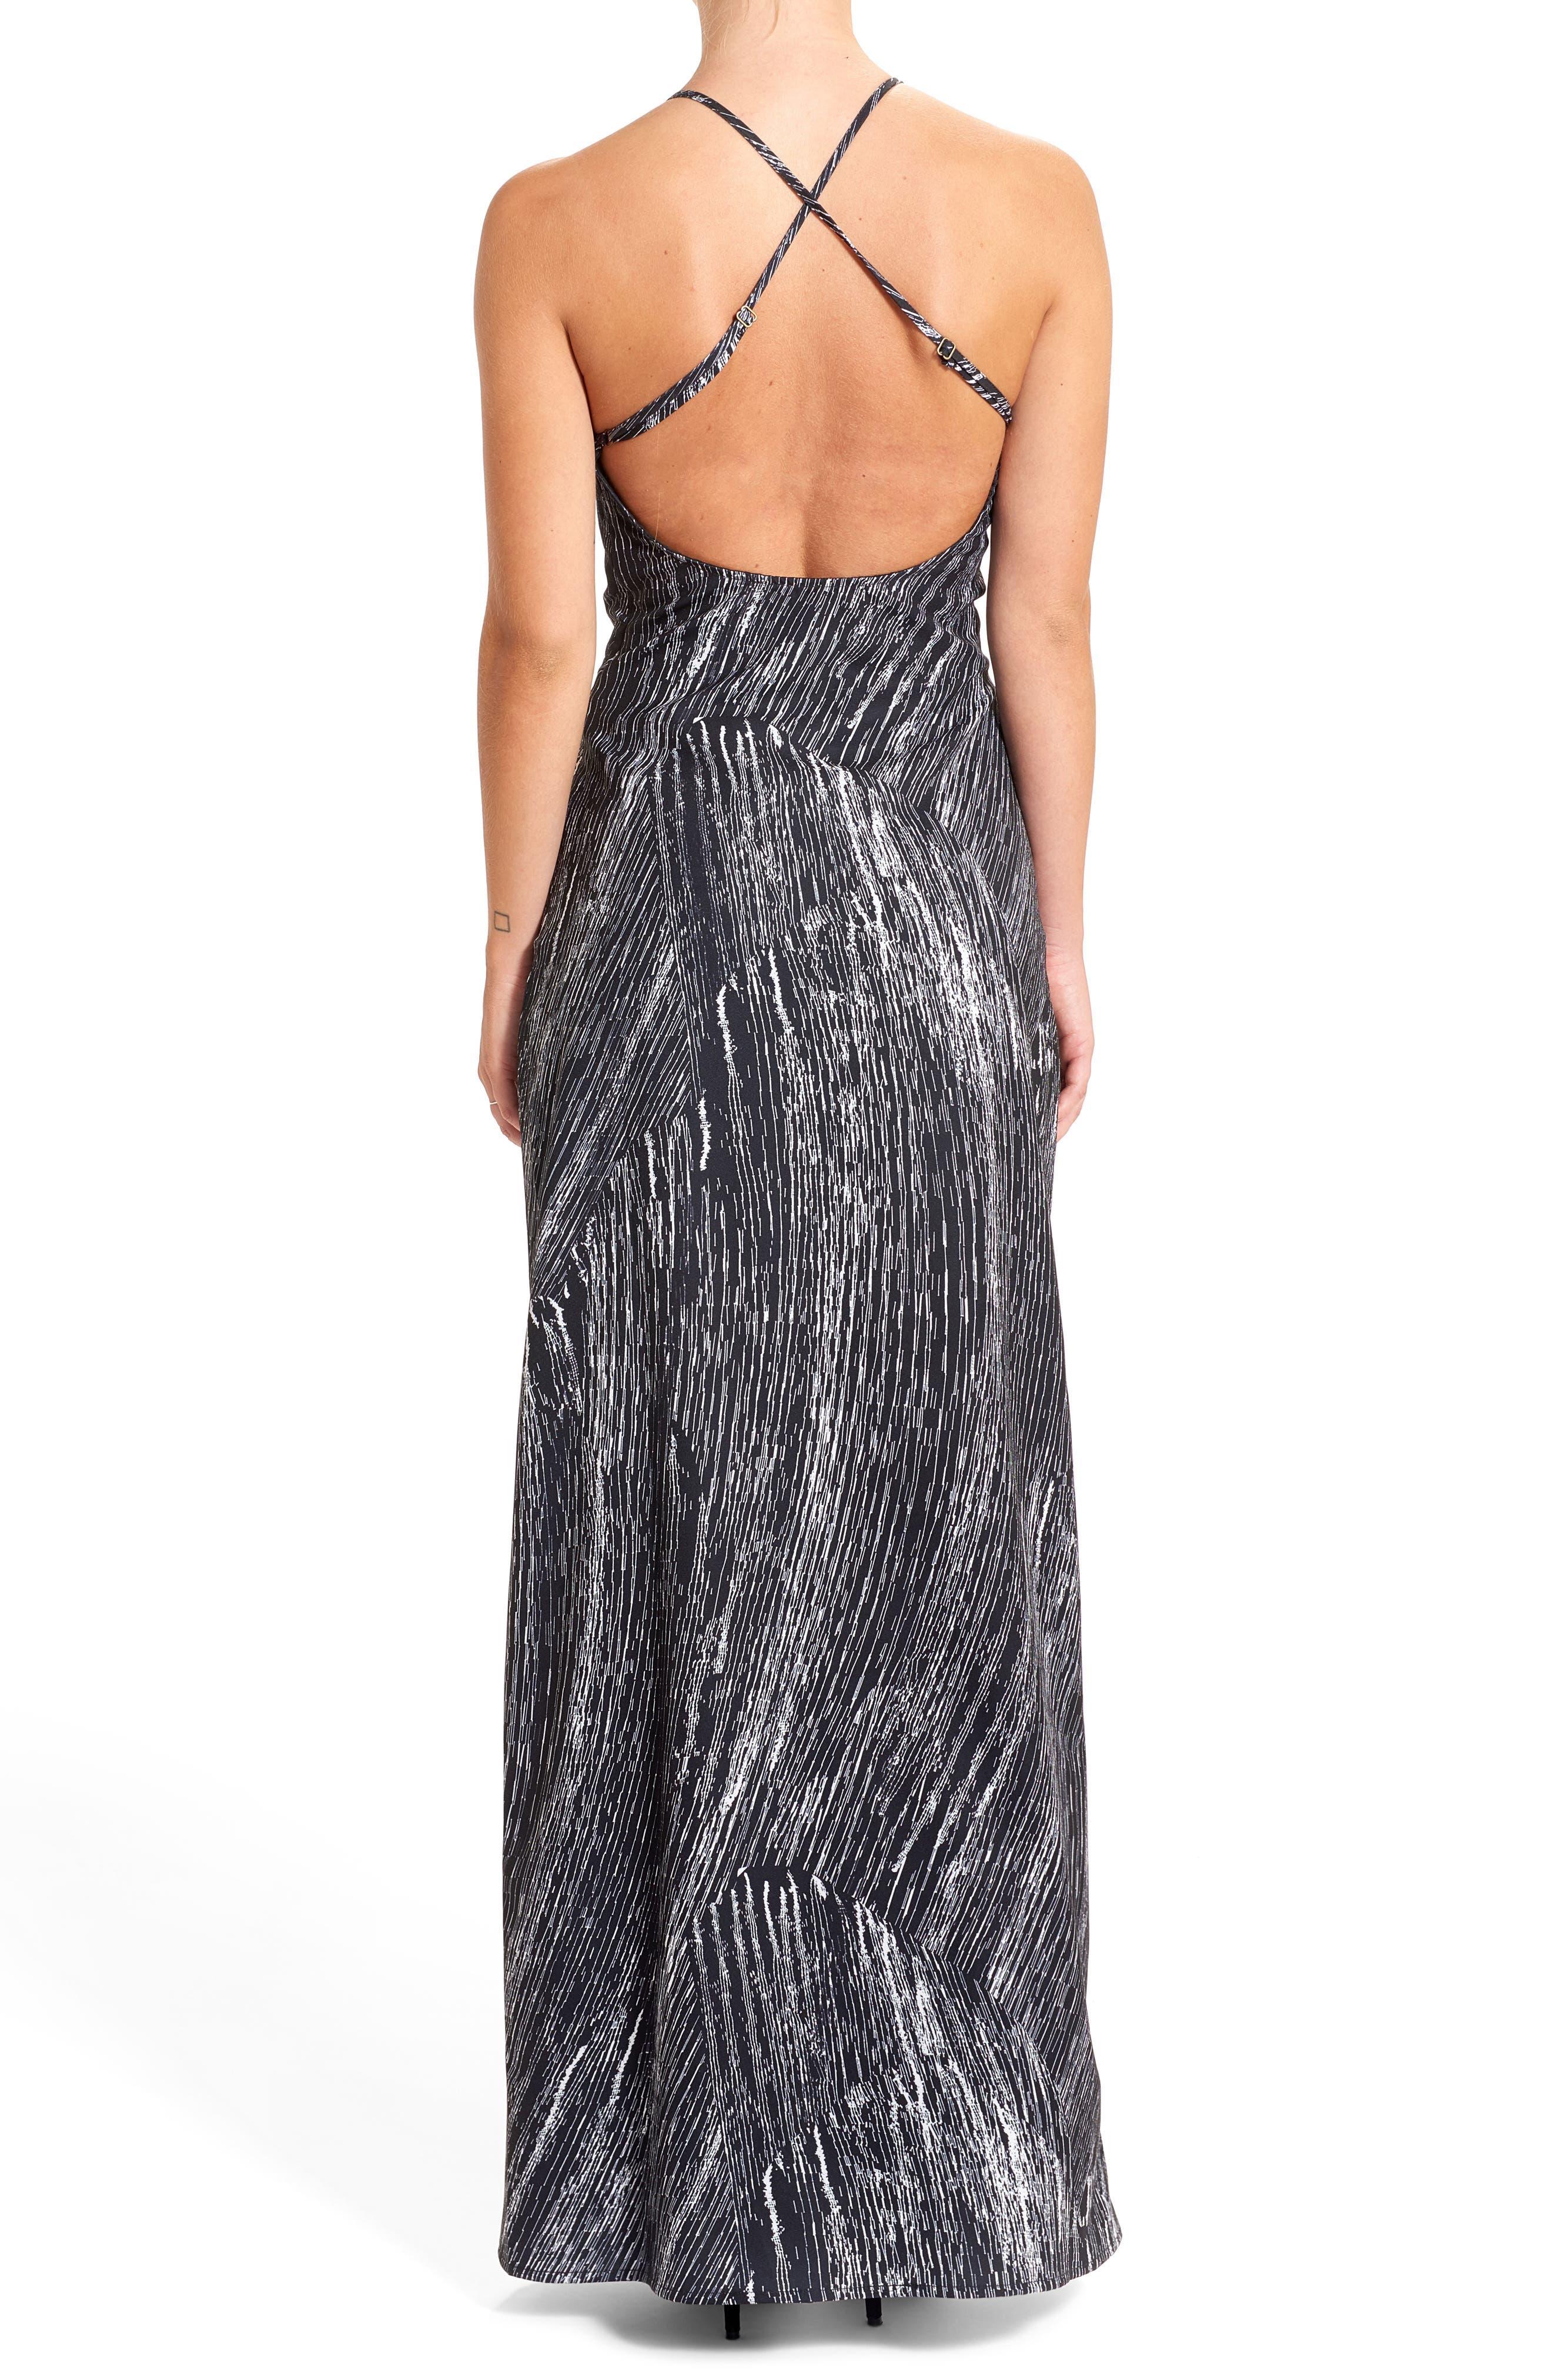 Halter Maxi Dress,                             Alternate thumbnail 2, color,                             Creme/ Black